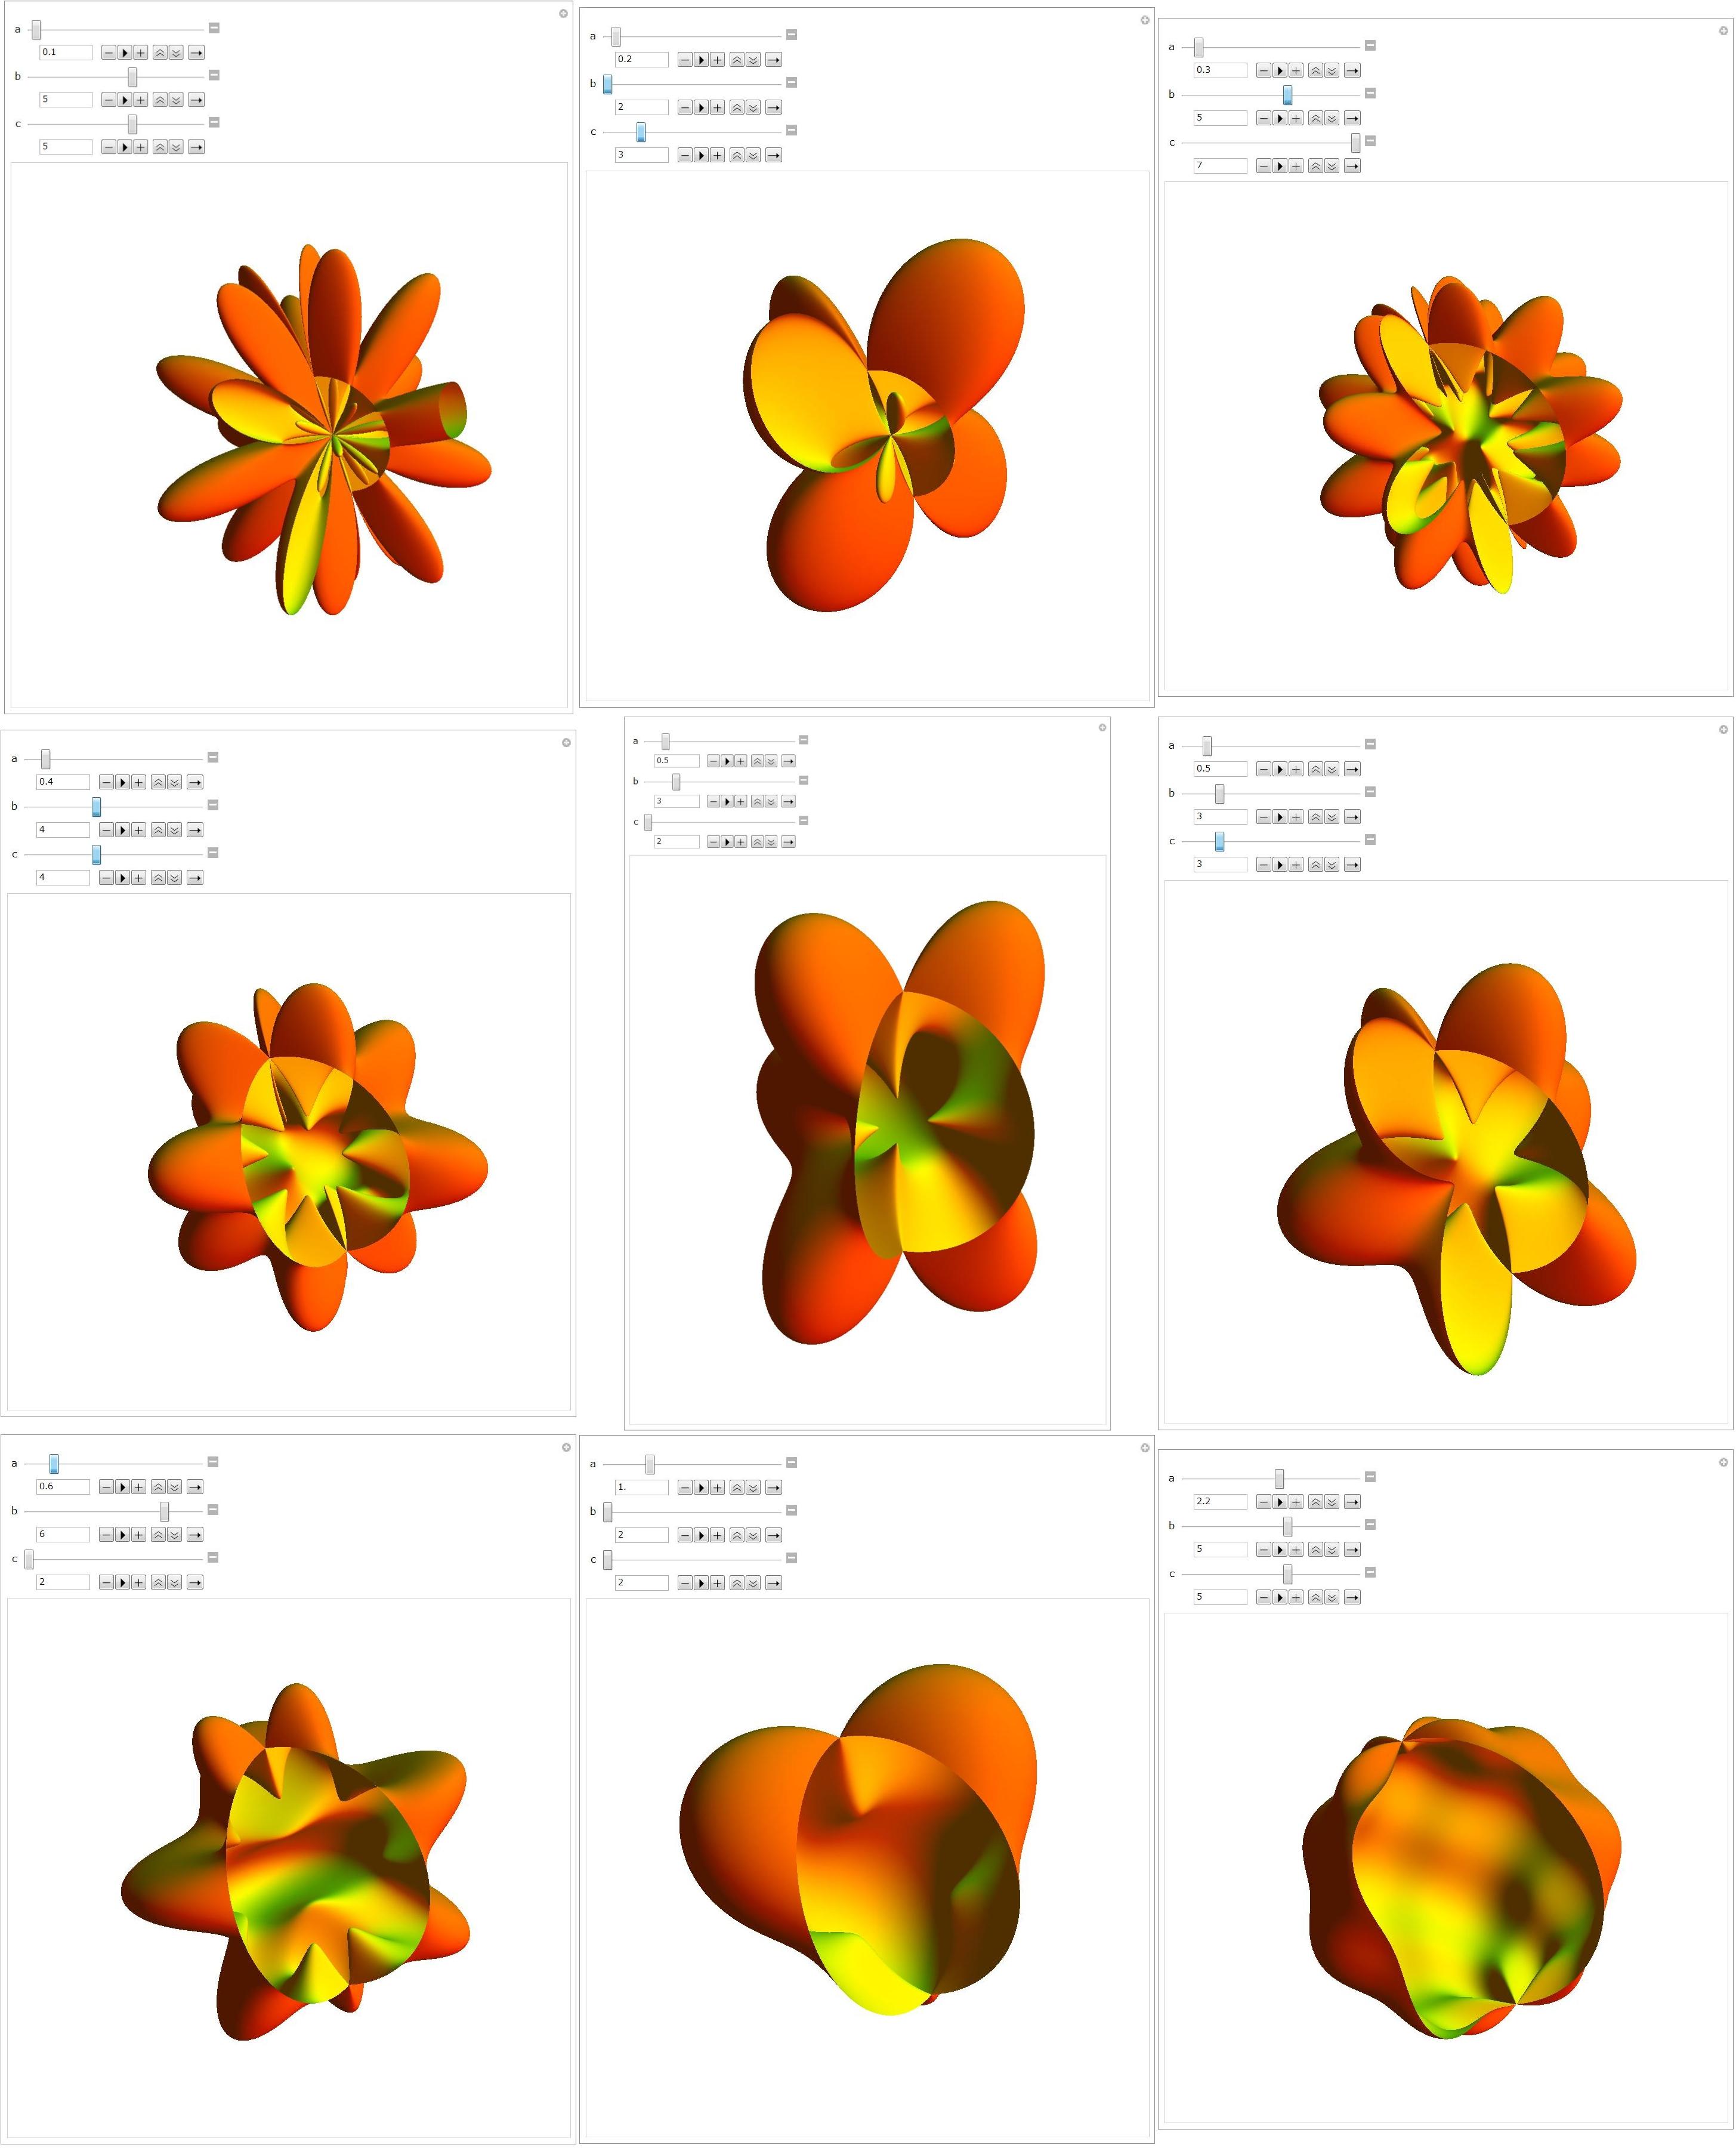 Fotos gratis : estructura, planta, hoja, flor, pétalo, naranja ...